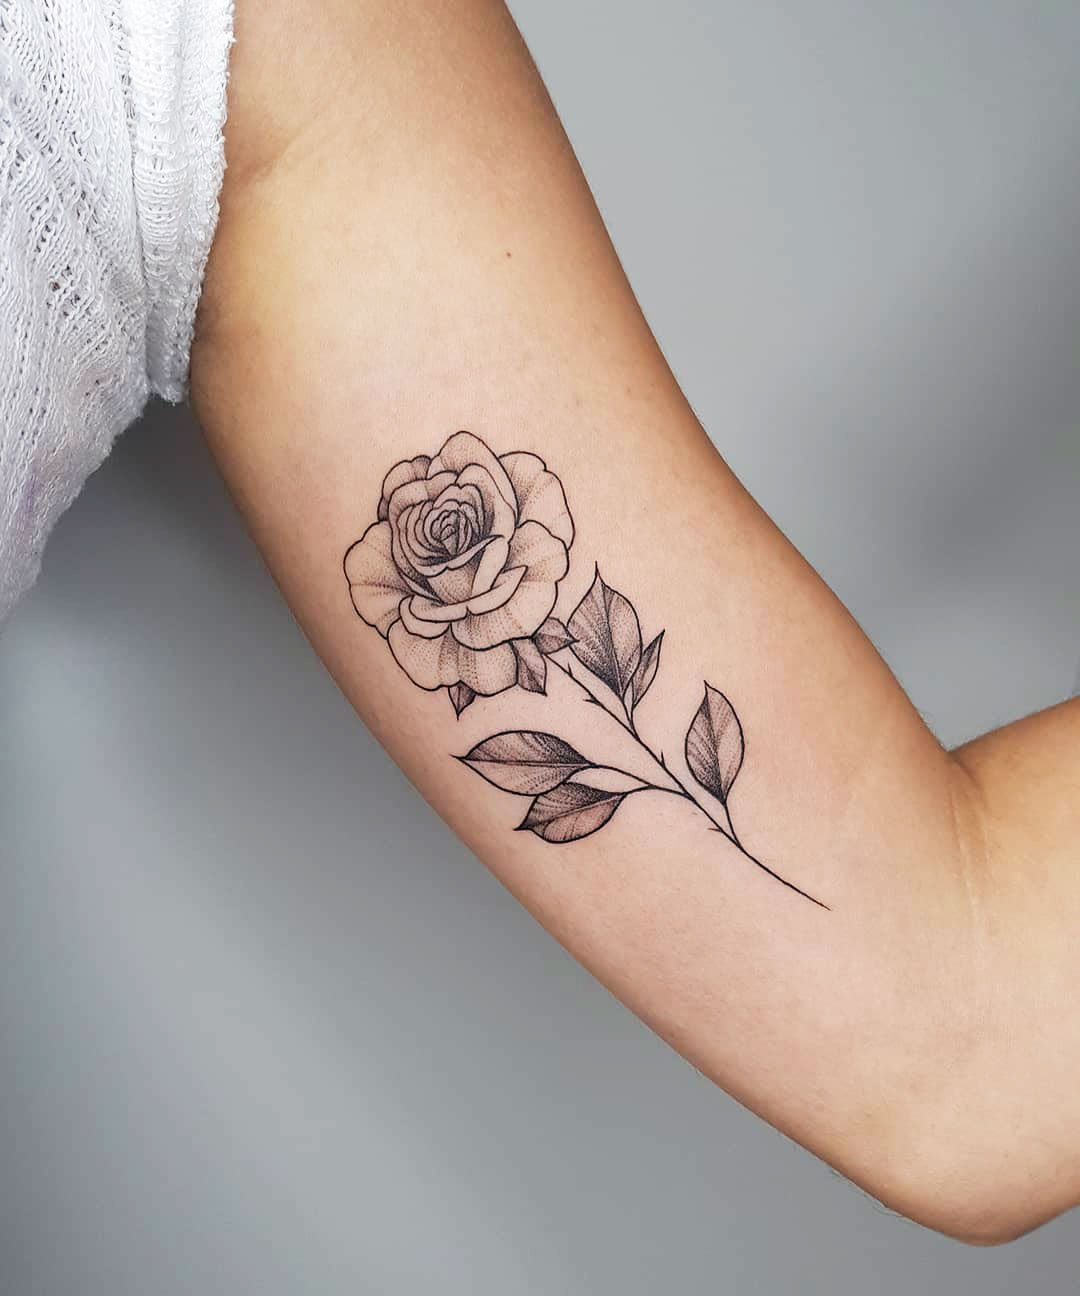 Tattoo Inscriptions About Parents - Love Tattoo